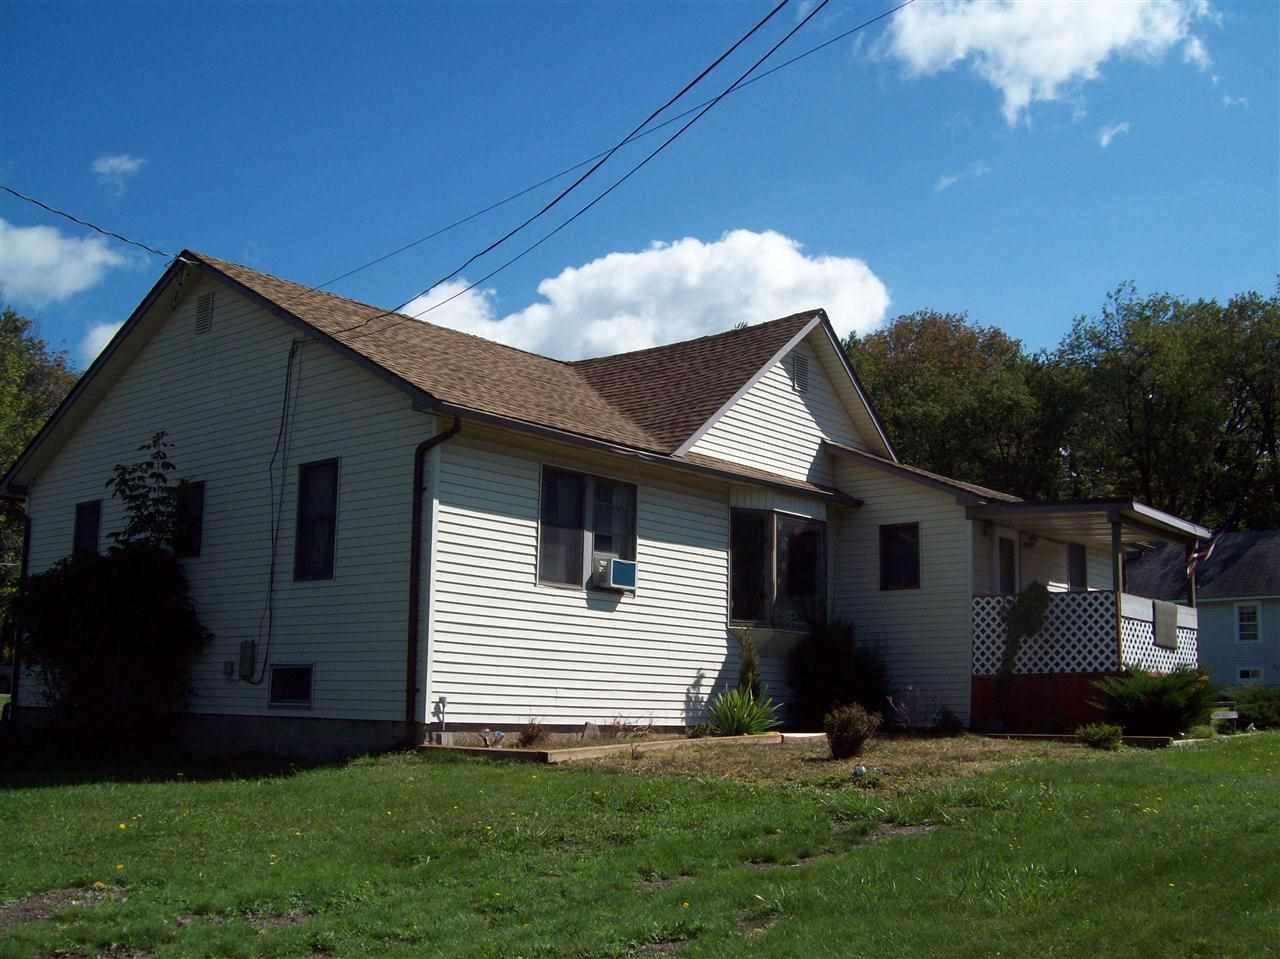 Rental Homes for Rent, ListingId:31957082, location: 57 Cimarron Road Monticello 12701